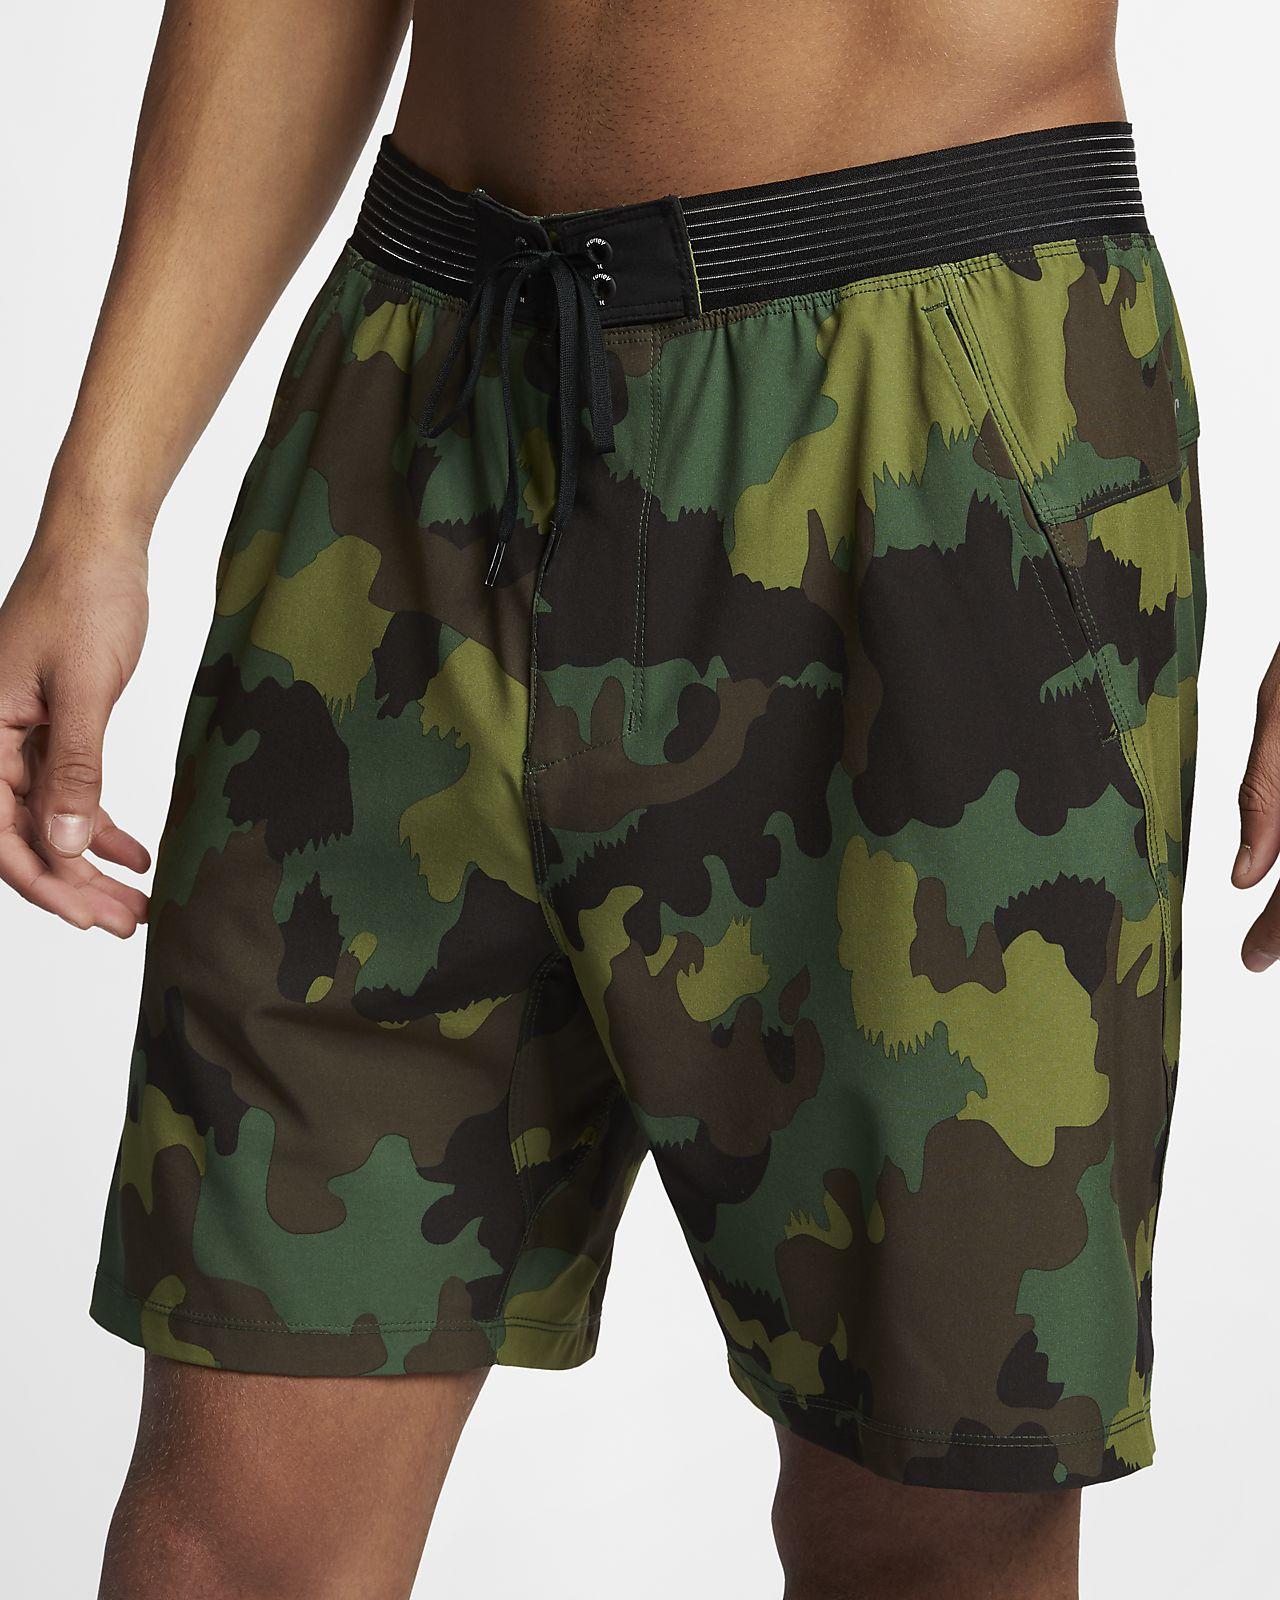 Hurley Phantom Alpha Trainer Men's 46cm Camo Shorts